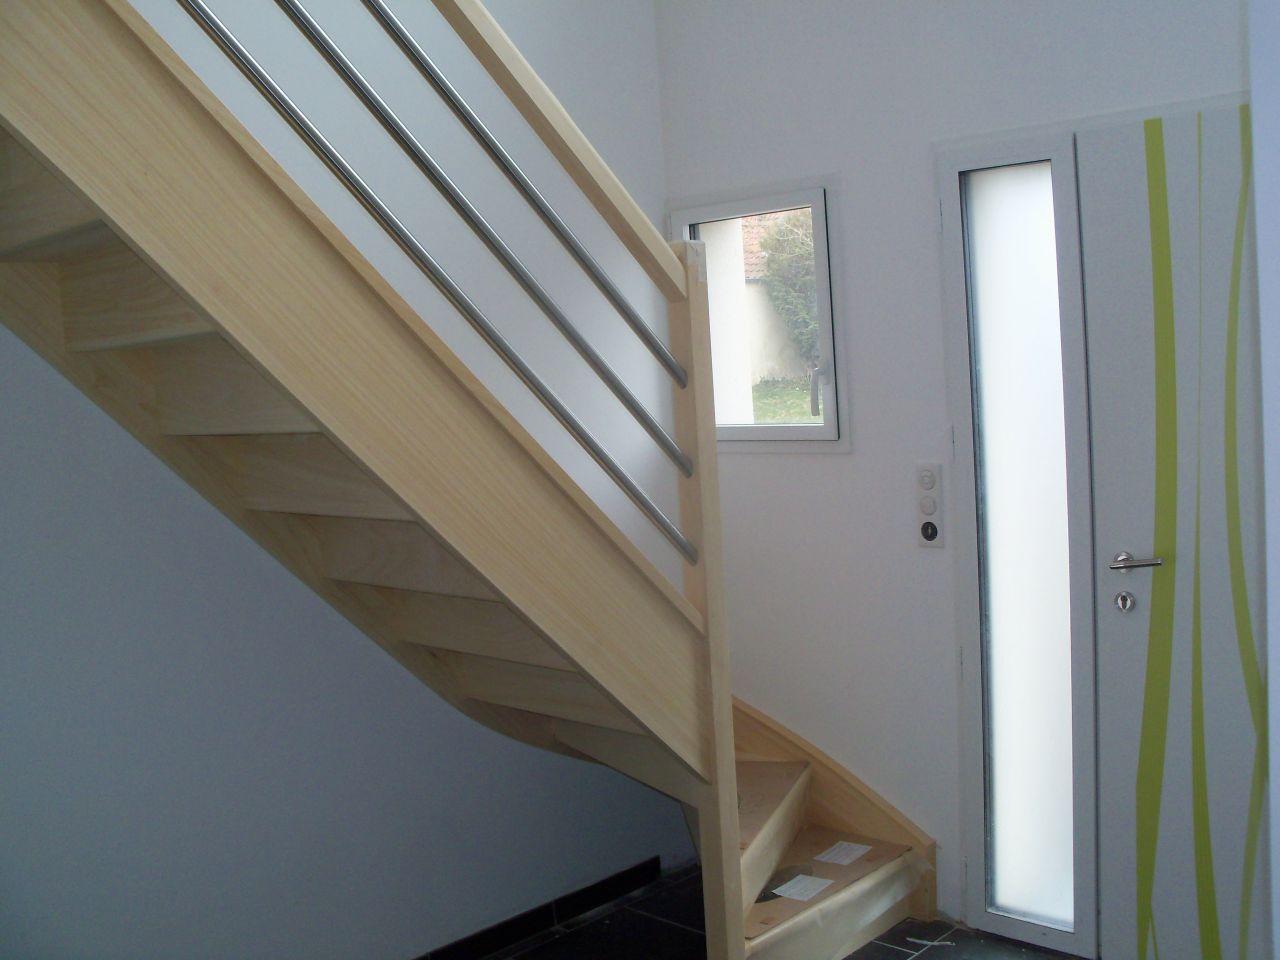 escalier pos pas de calais. Black Bedroom Furniture Sets. Home Design Ideas